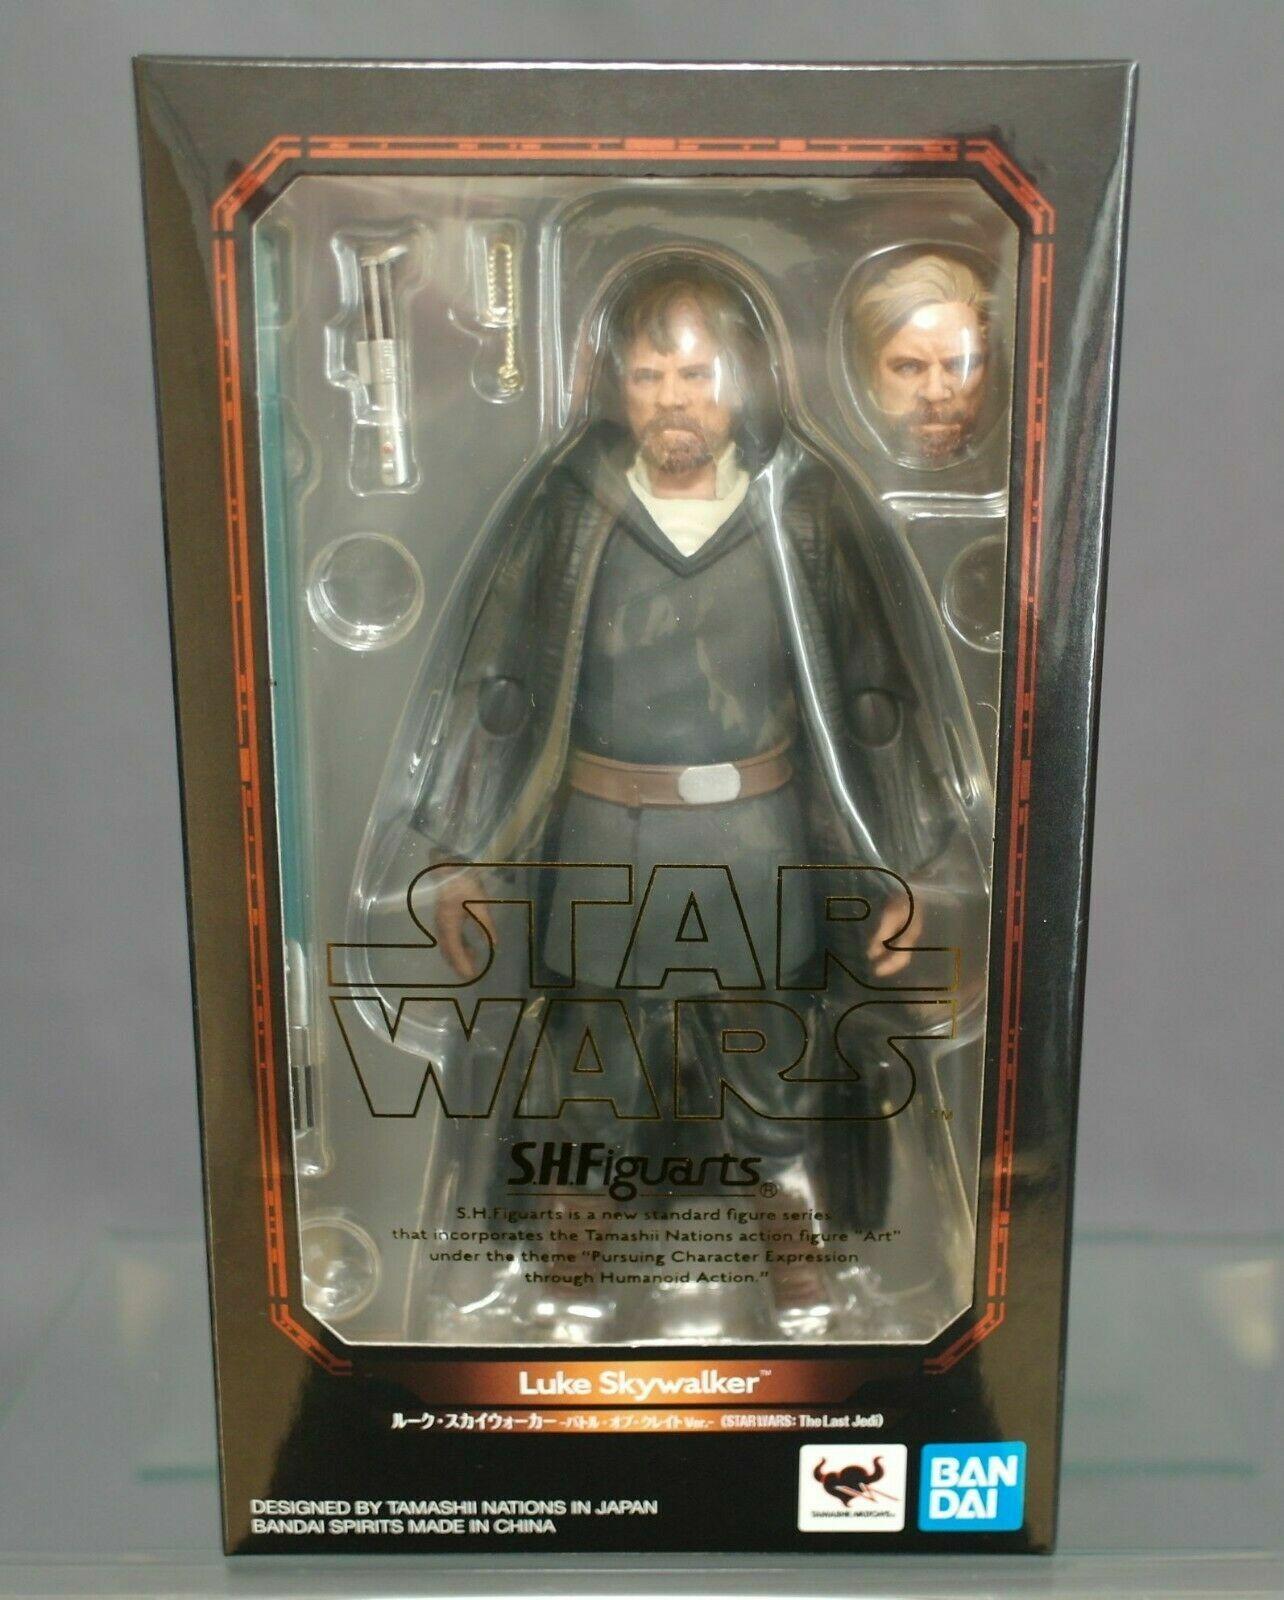 S.H.Figuarts Luke Skywalker kämpfen of Crait Ver. Stern WARS The Last Jedi JP New